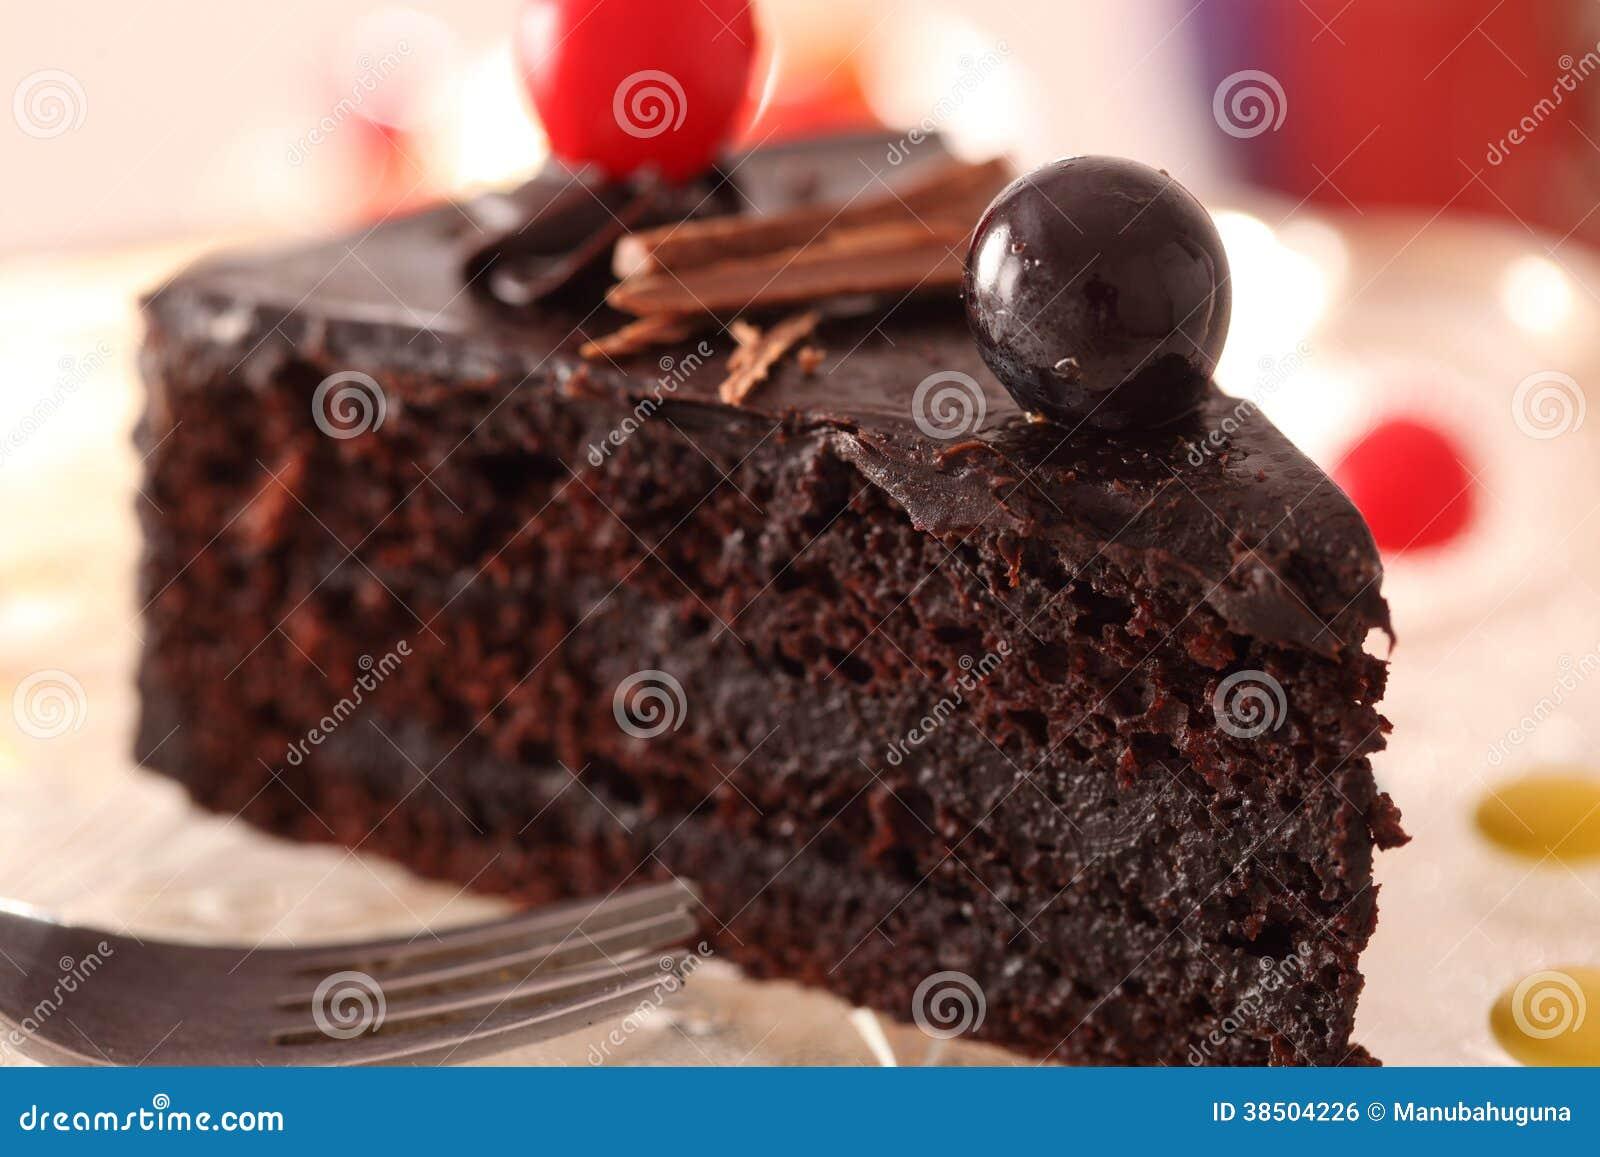 Chocolate Pastry Stock Photo Image Of Pastry Dessert